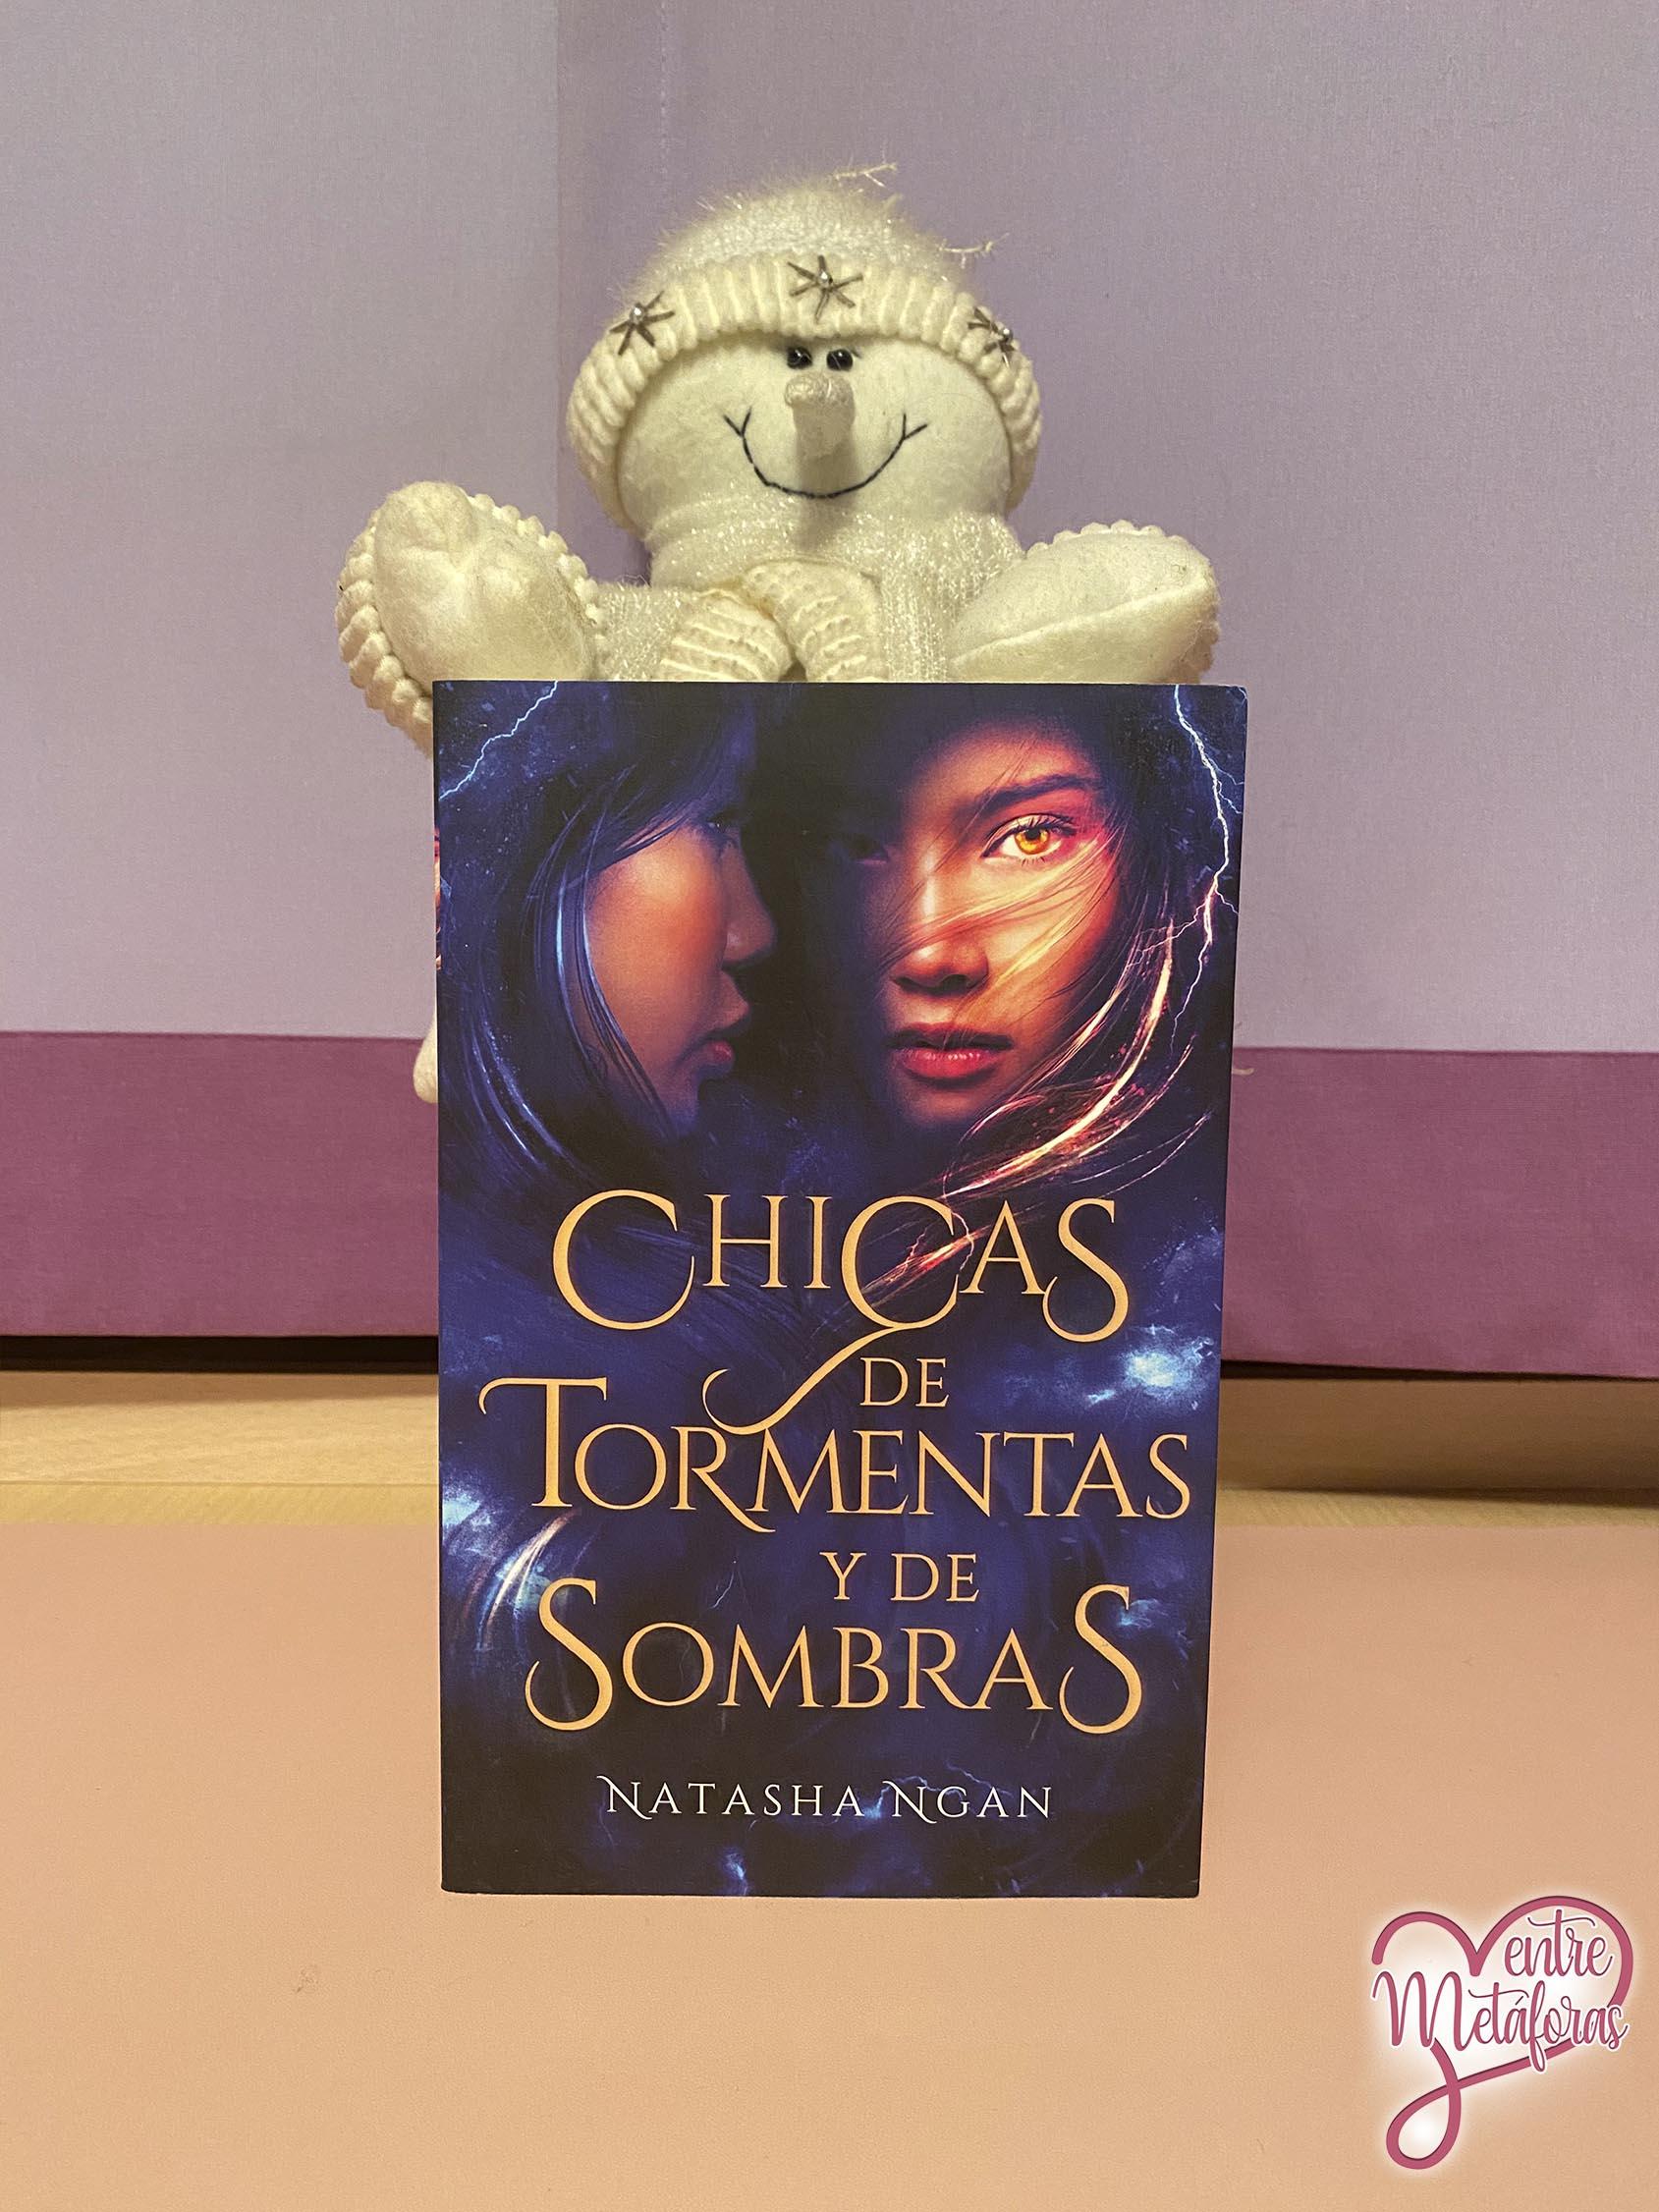 Chicas de Tormentas y de Sombras, de Natasha Ngan - Reseña